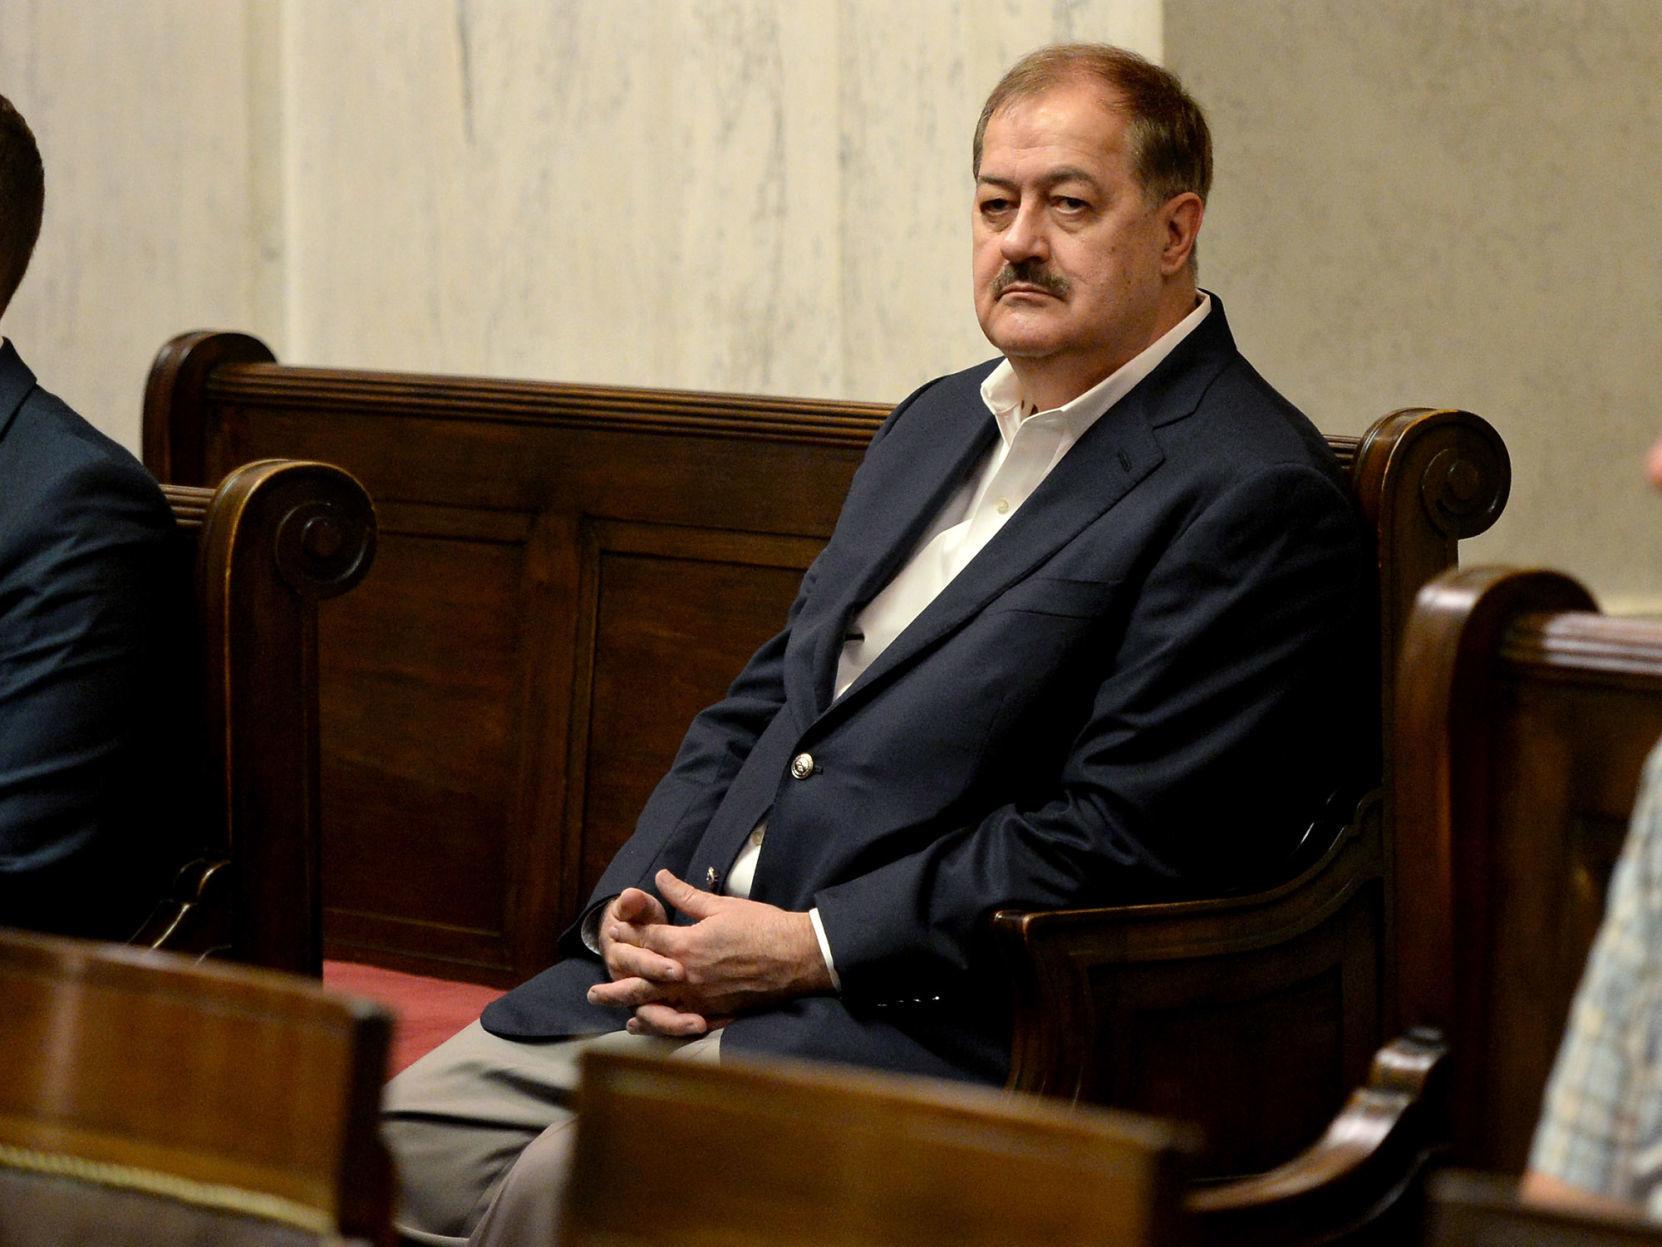 Judge denies Blankenship request to toss conviction